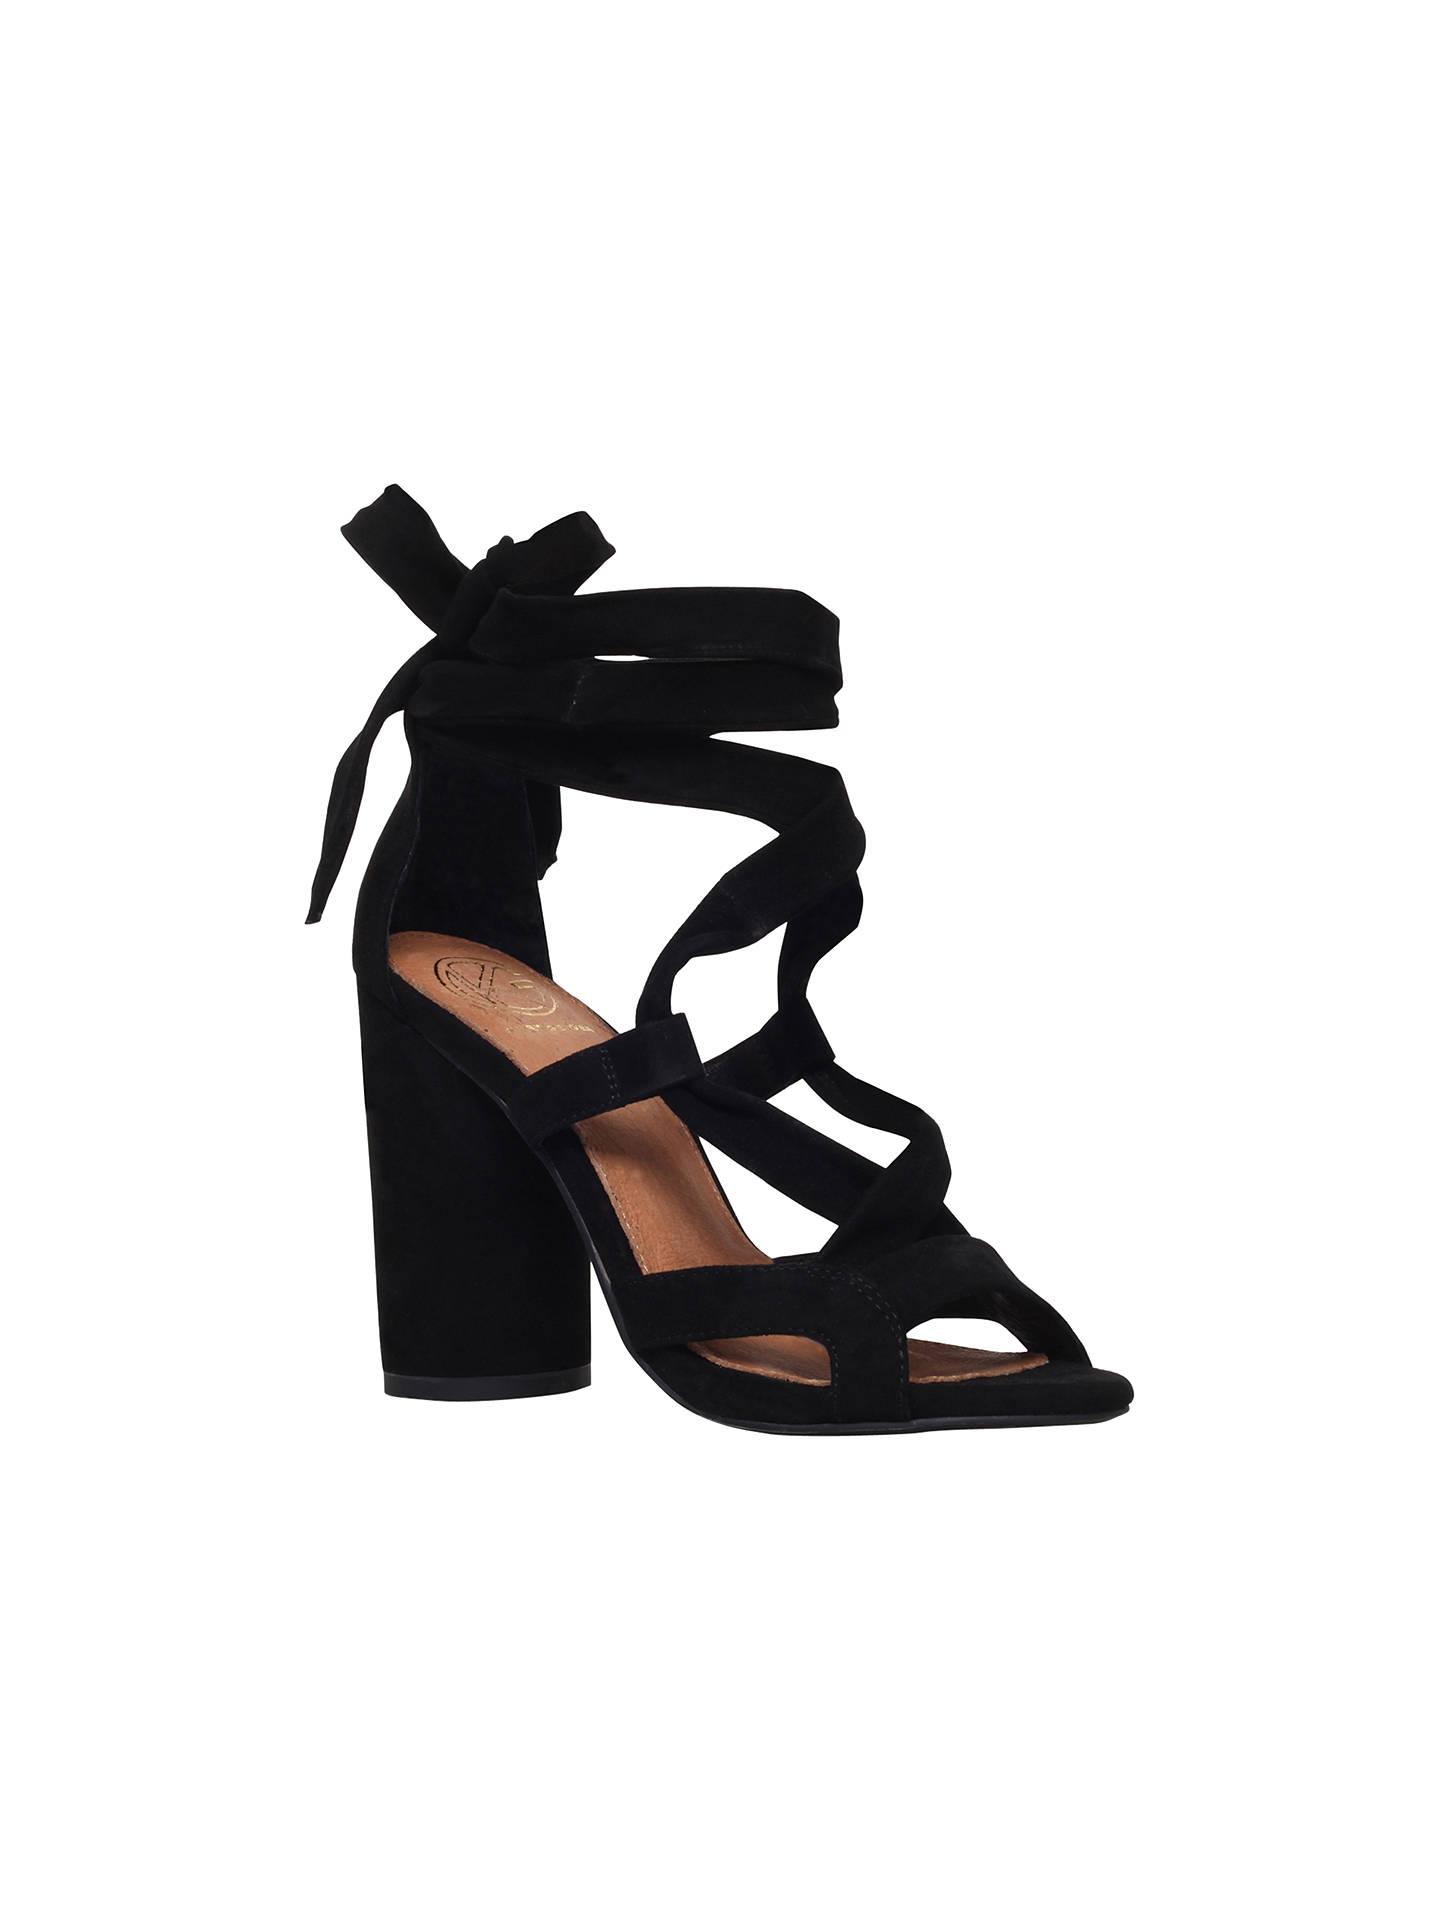 f8ee05c33d00 Buy KG by Kurt Geiger Mia Multi Strap Tie Sandals